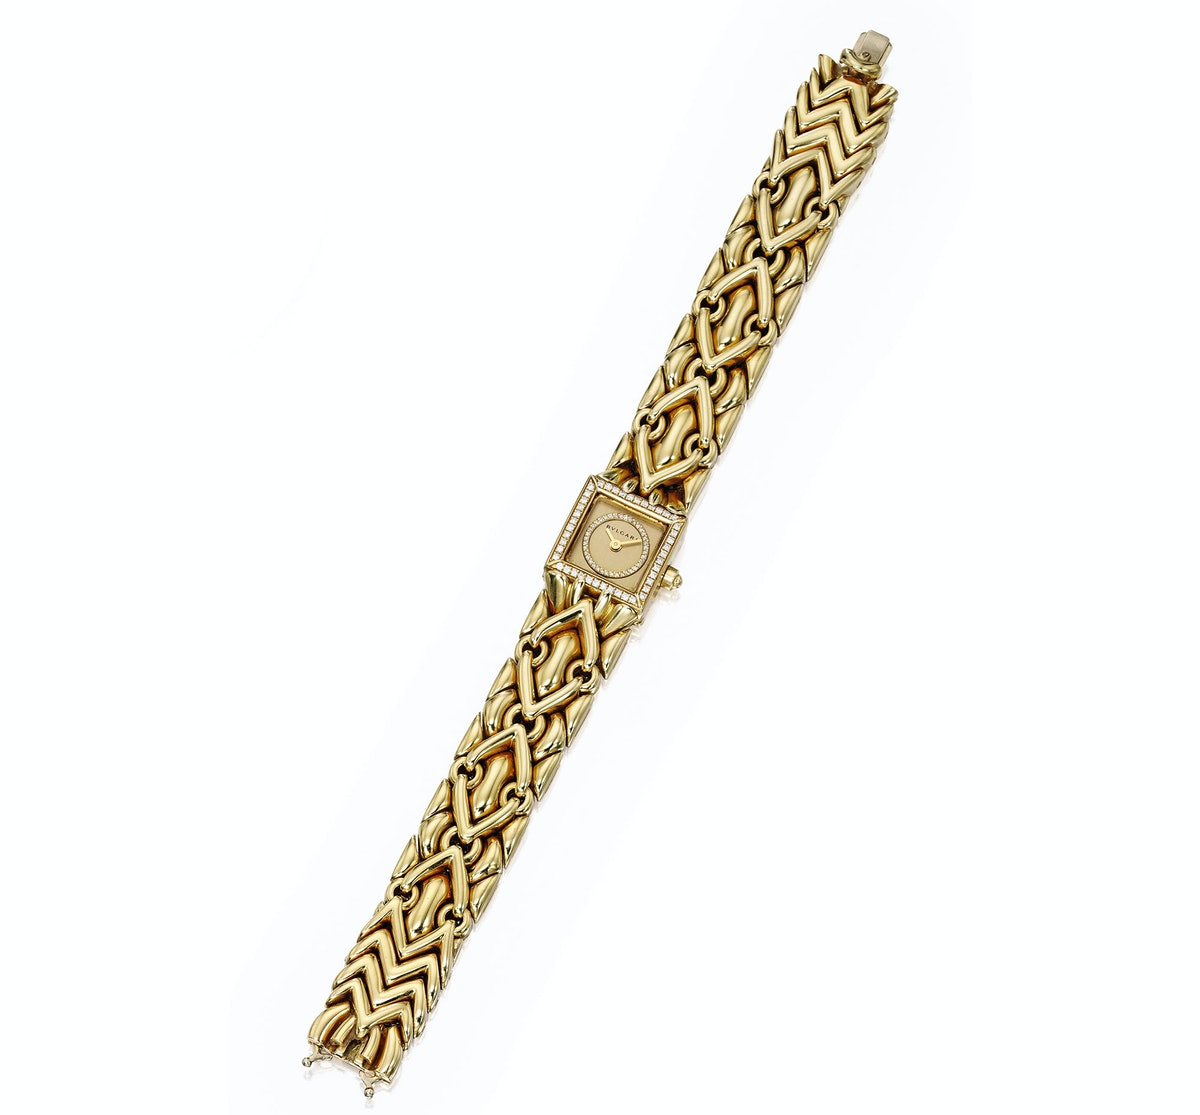 18 Karat Gold and Diamond 'Trika' Wristwatch, Bulgari